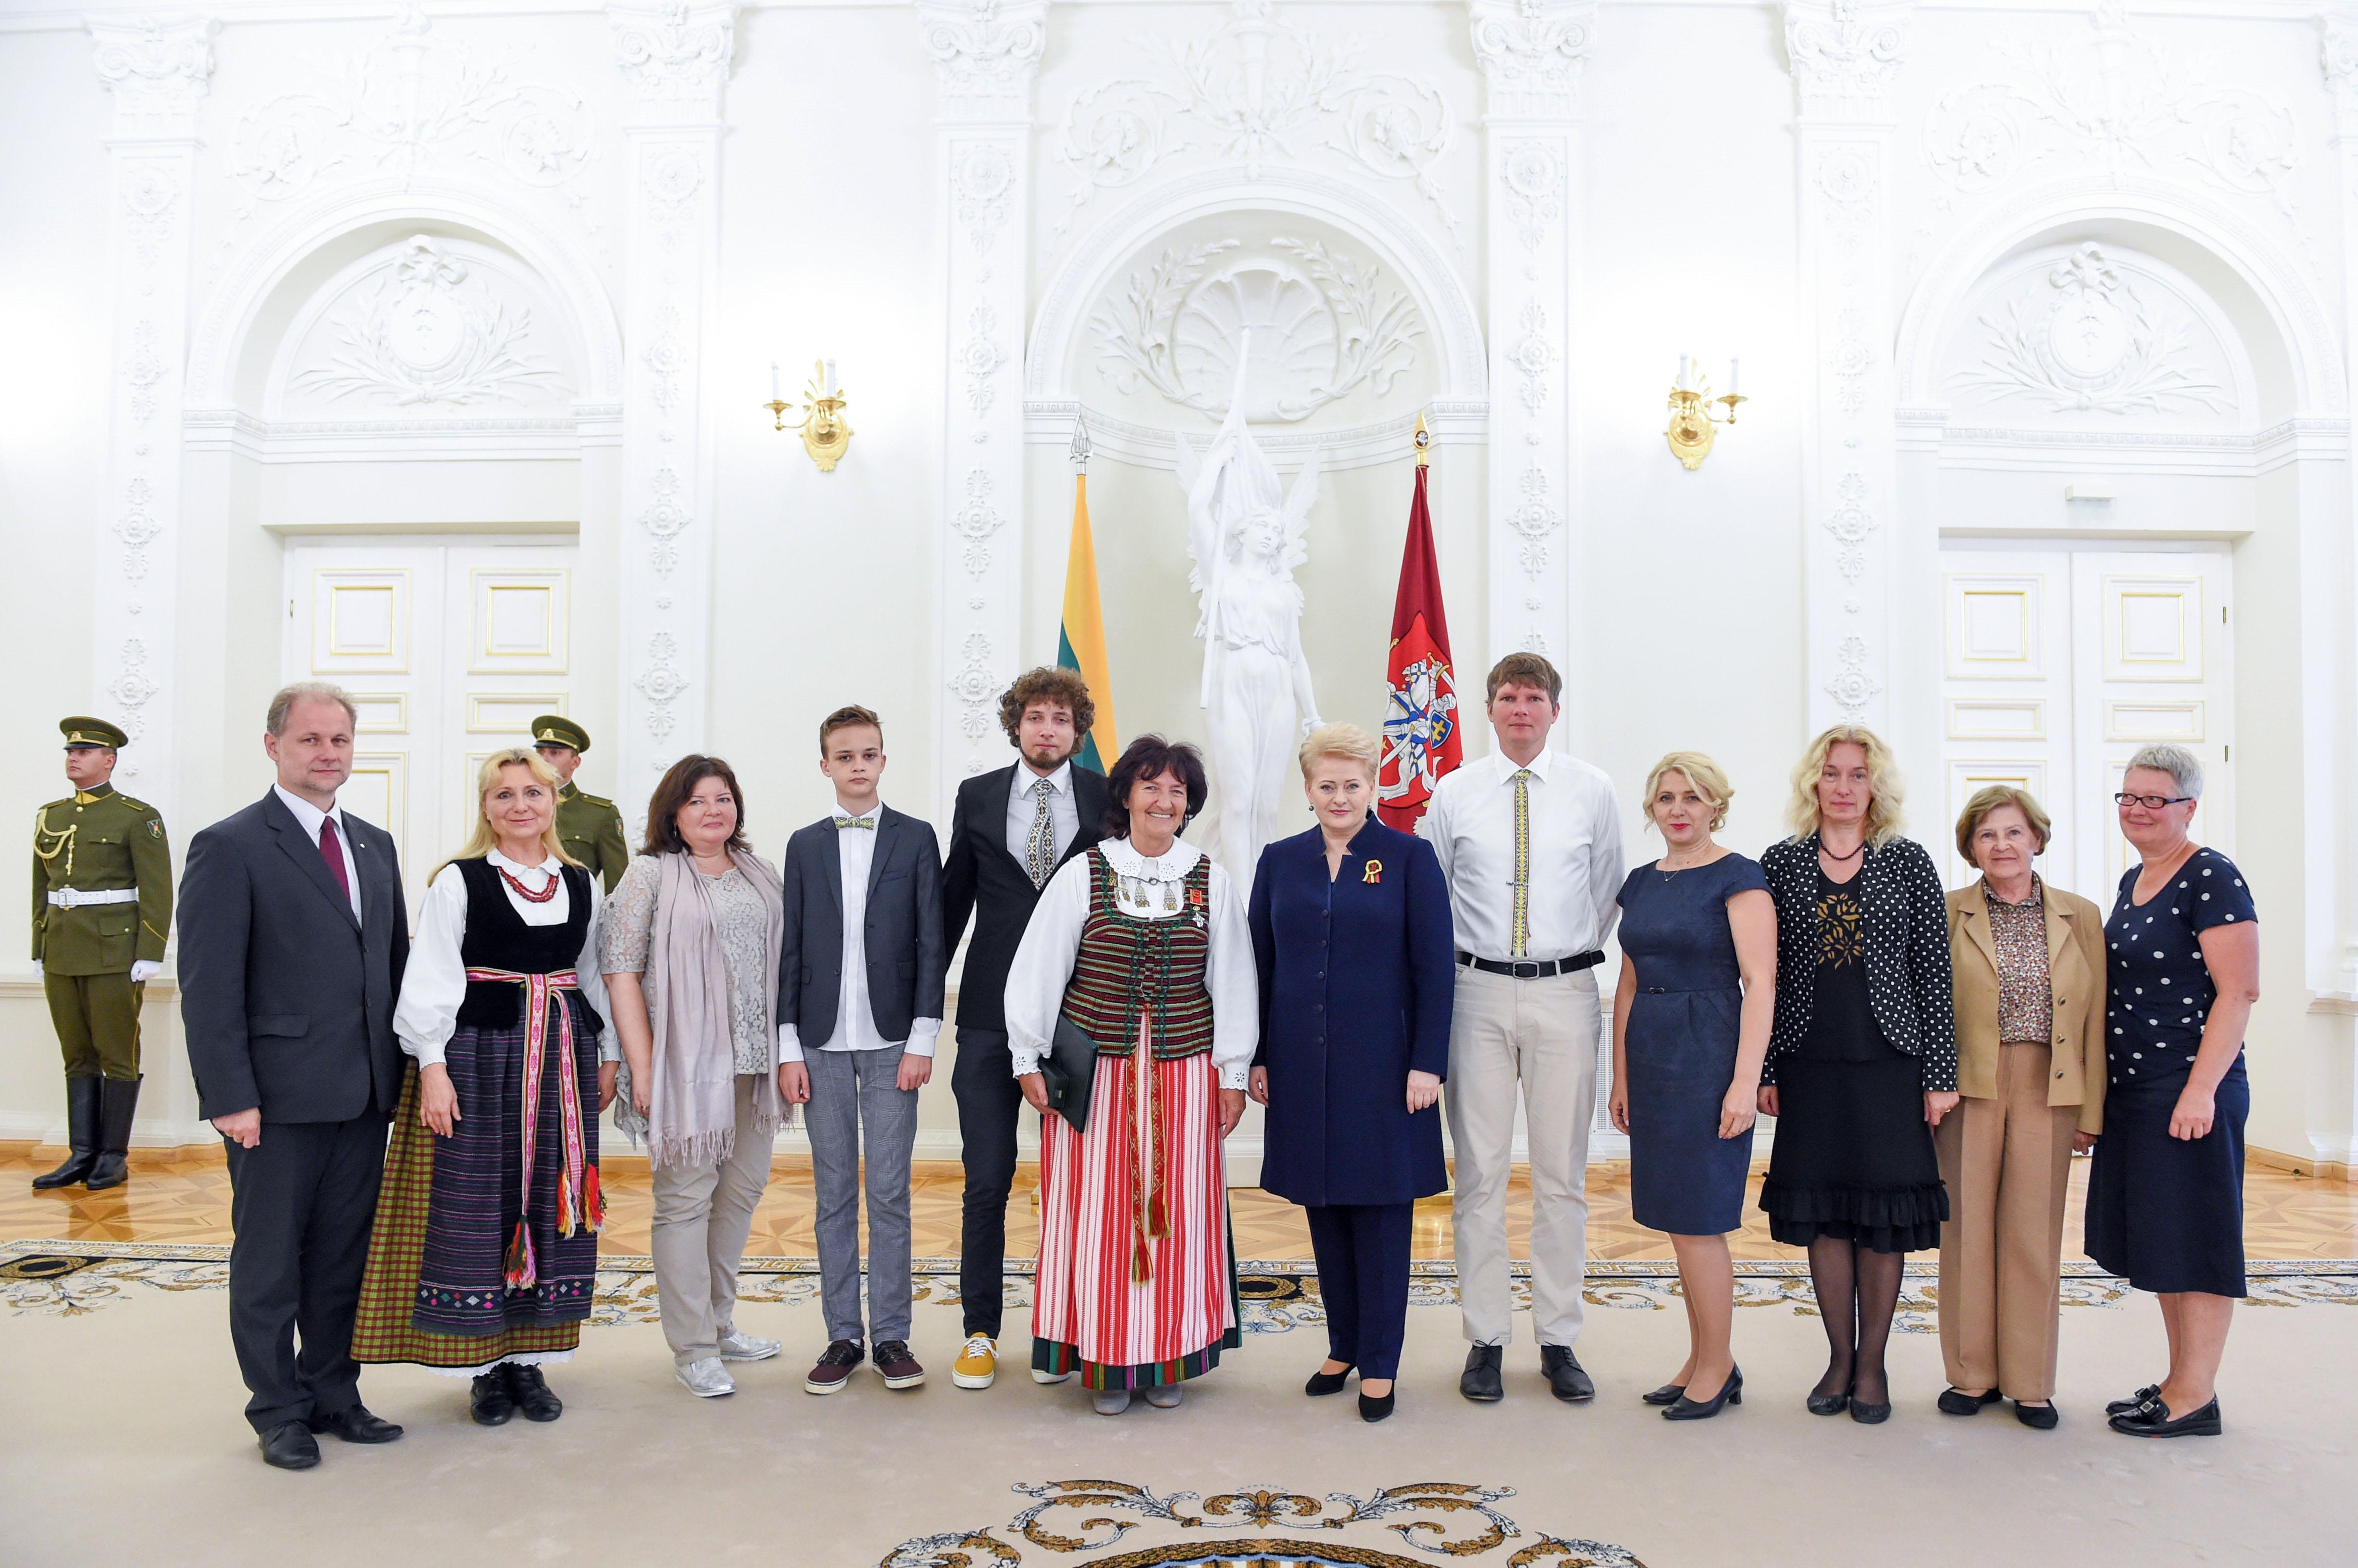 n-balciuniene-apdovanojama-prezidenturoje-lrp-lt-r-dackaus-nuotr